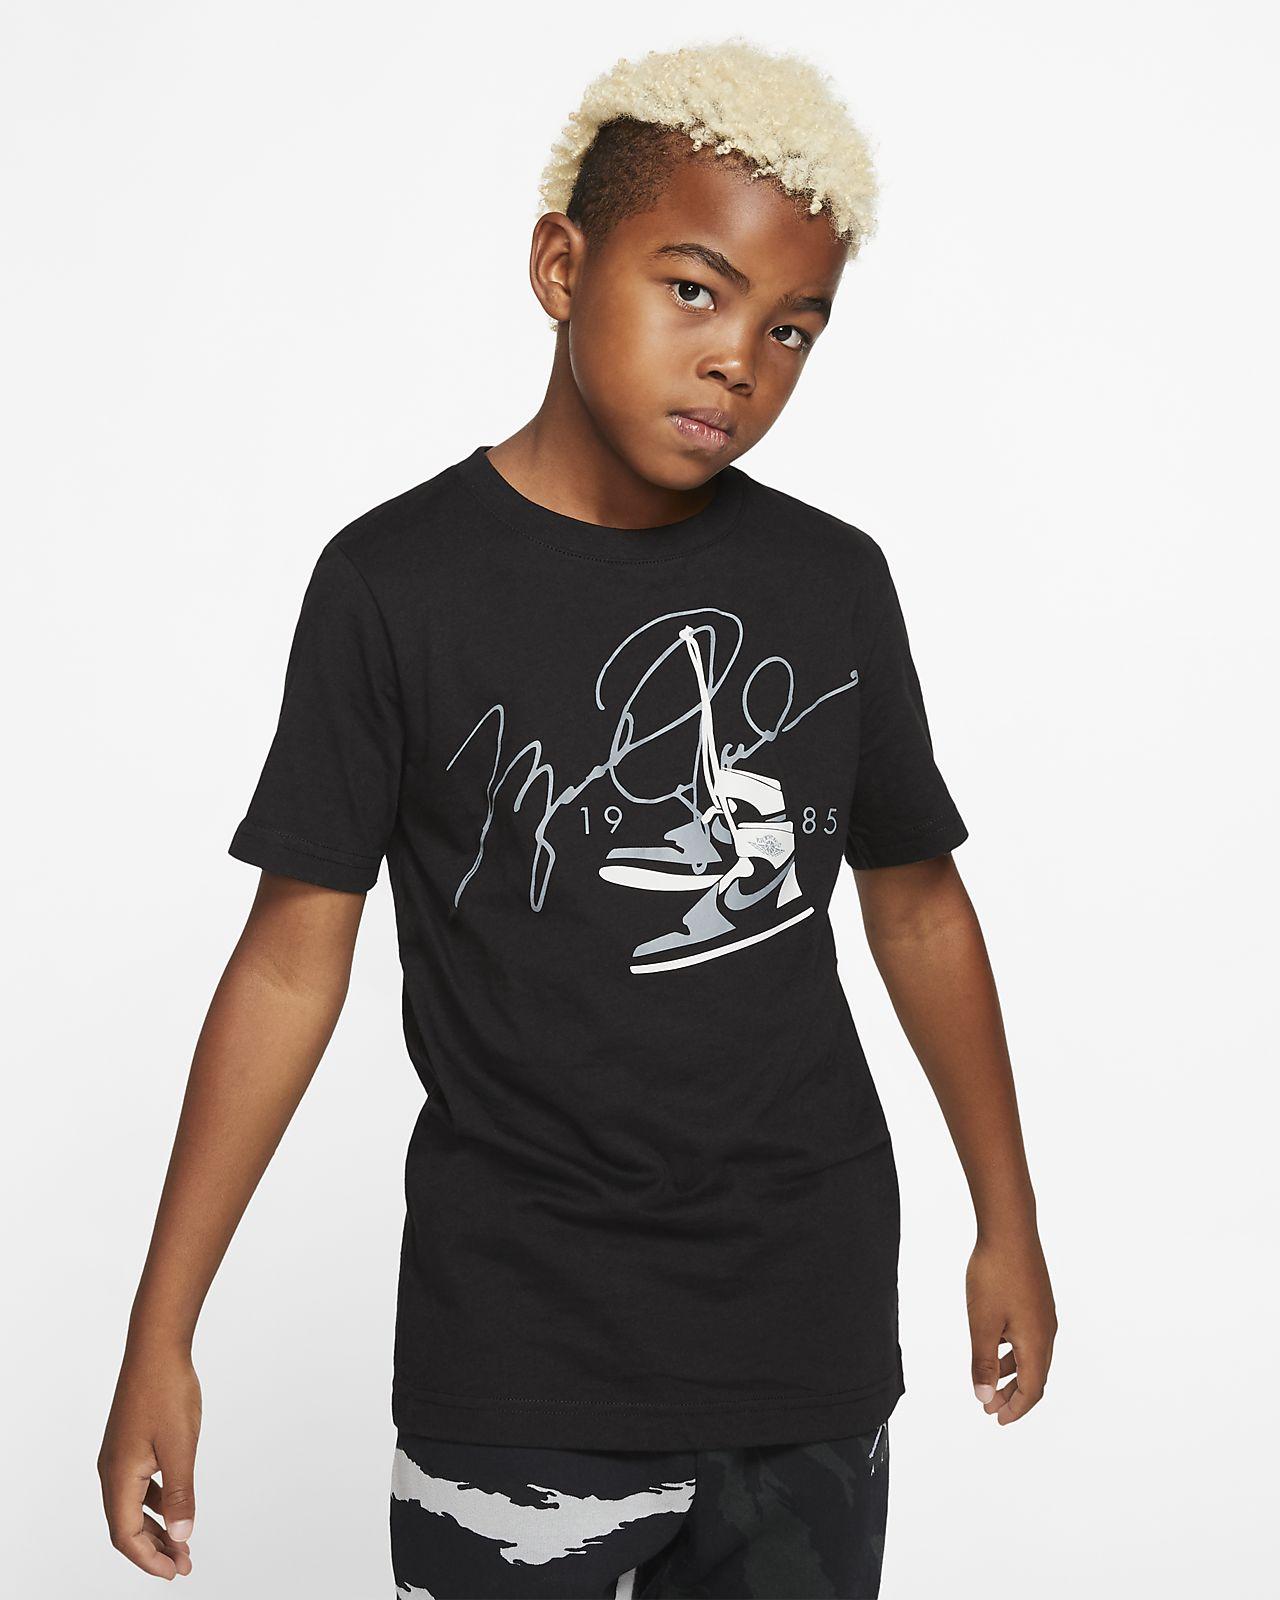 T-shirt de manga curta Jordan Júnior (Rapaz)